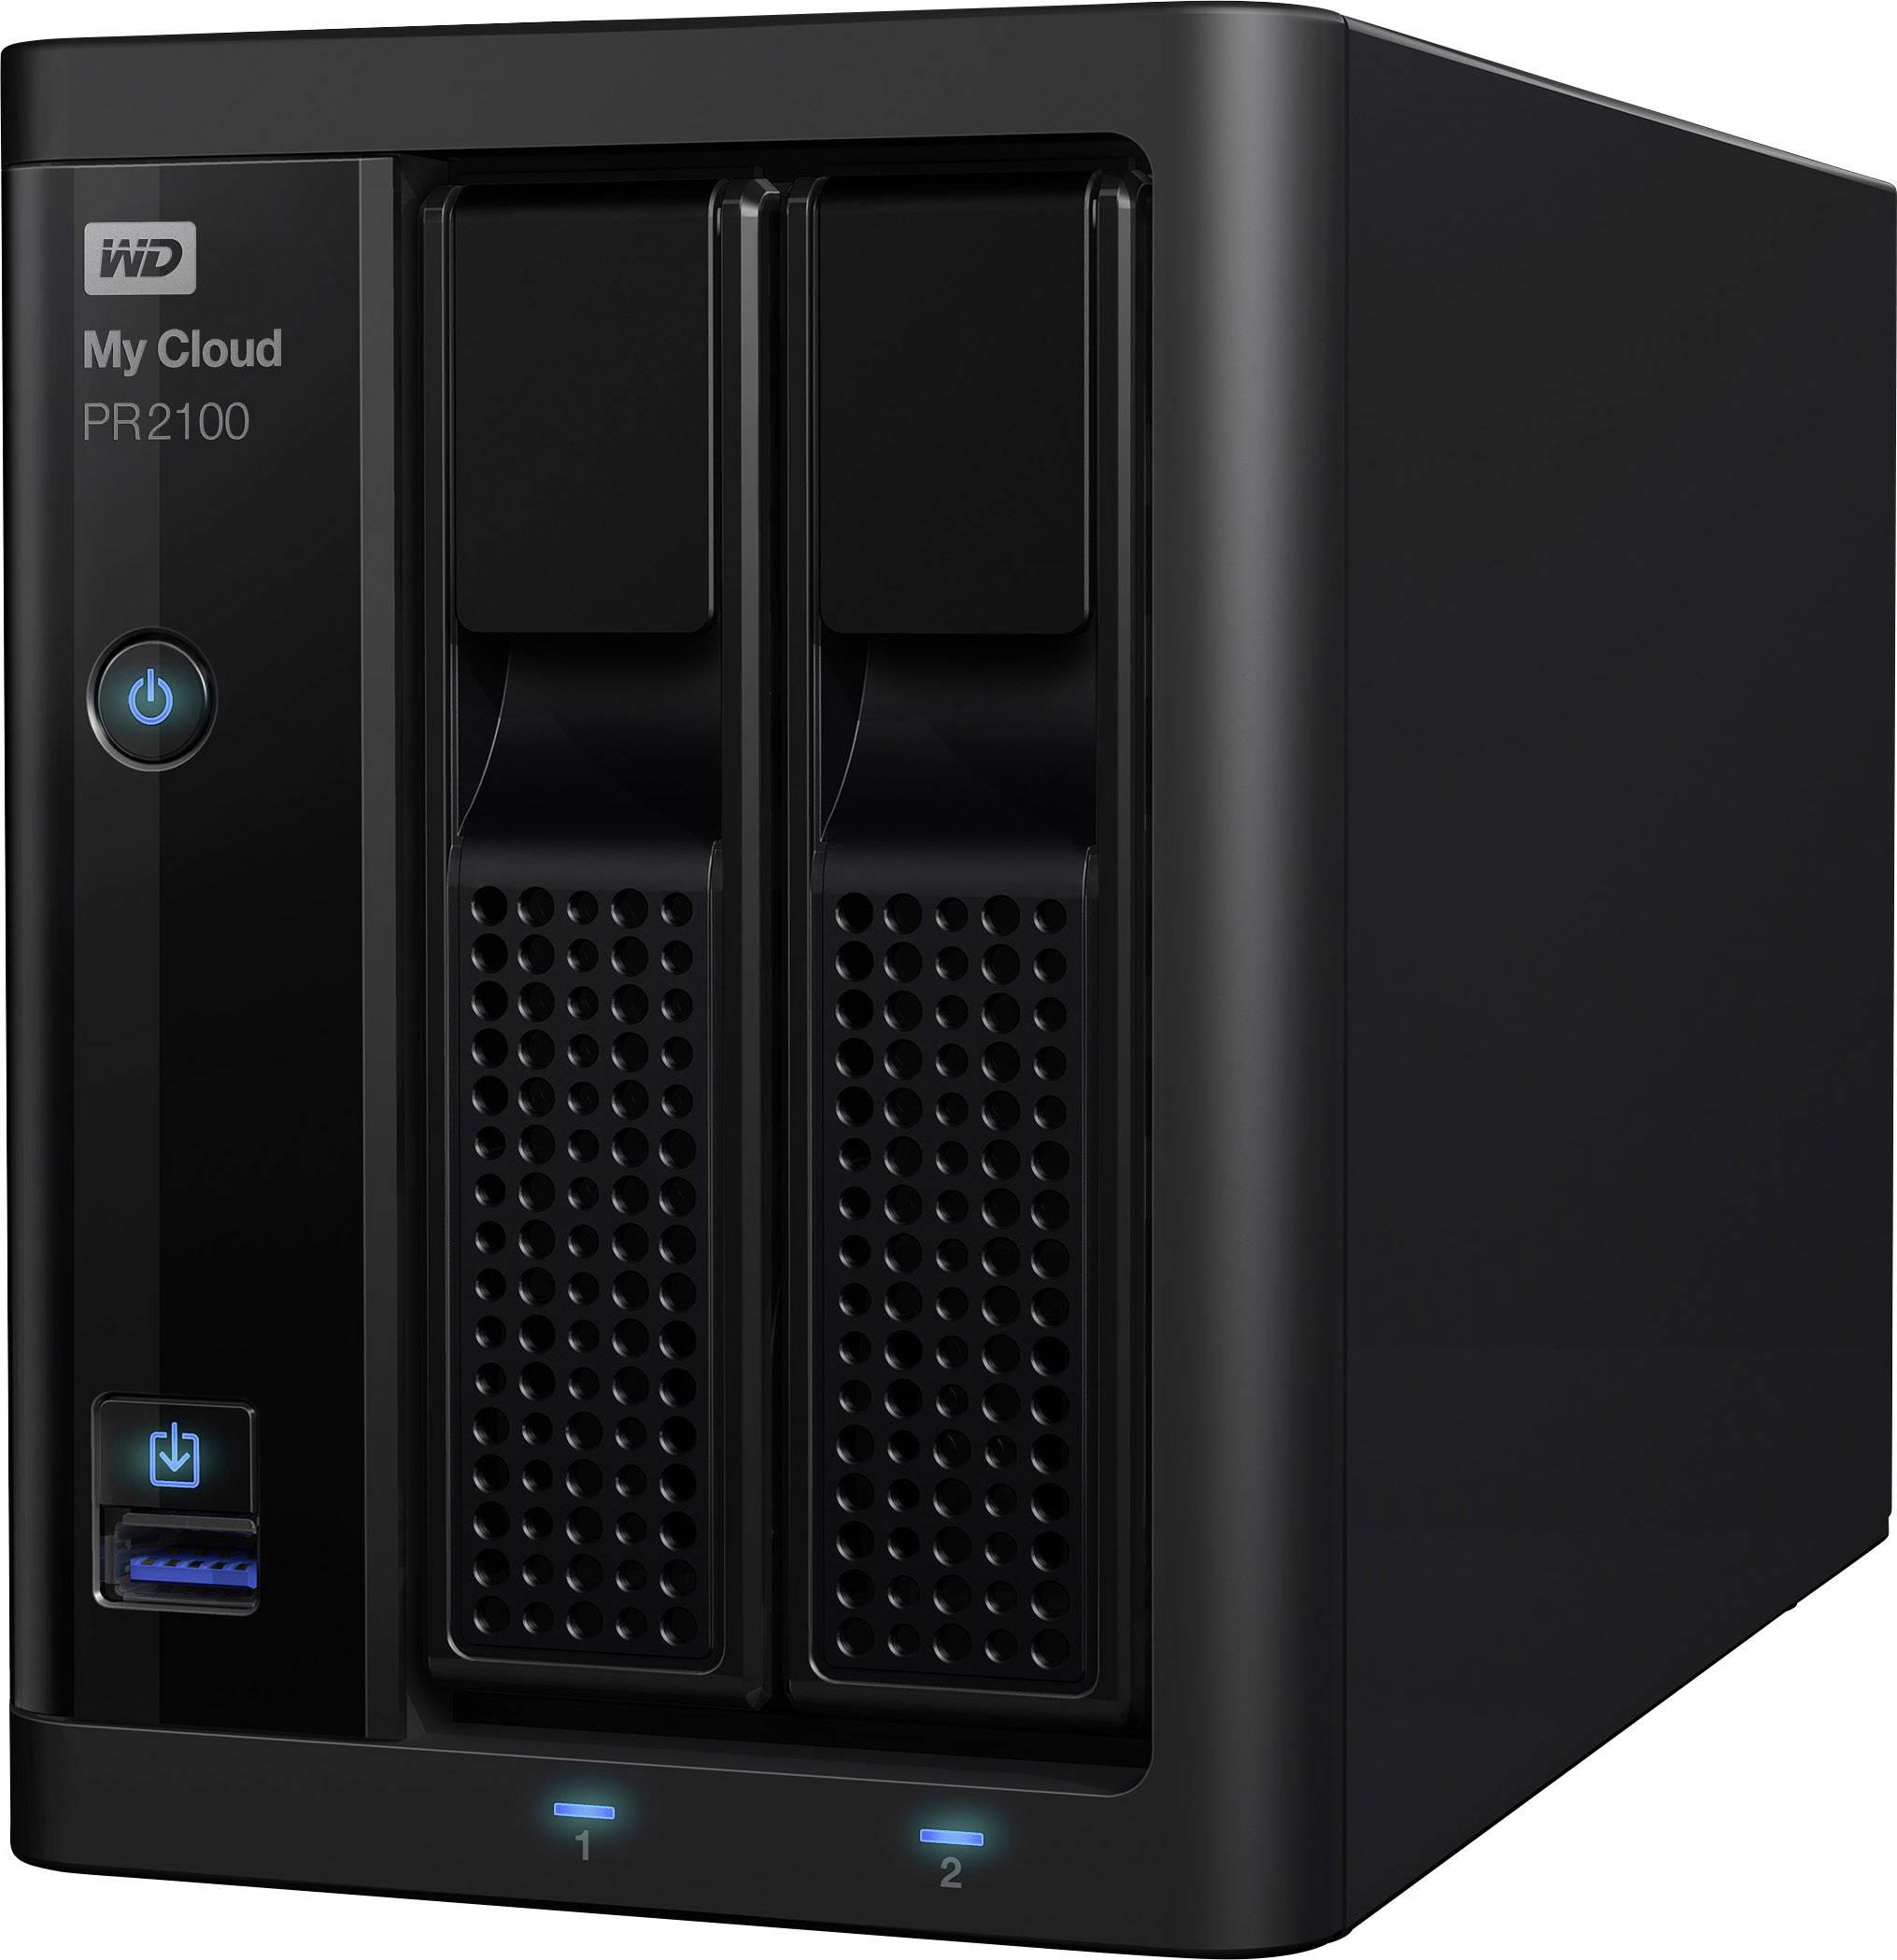 NAS server Western Digital My Cloud™ Pro PR2100 WDBBCL0120JBK-EESN, 12 TB